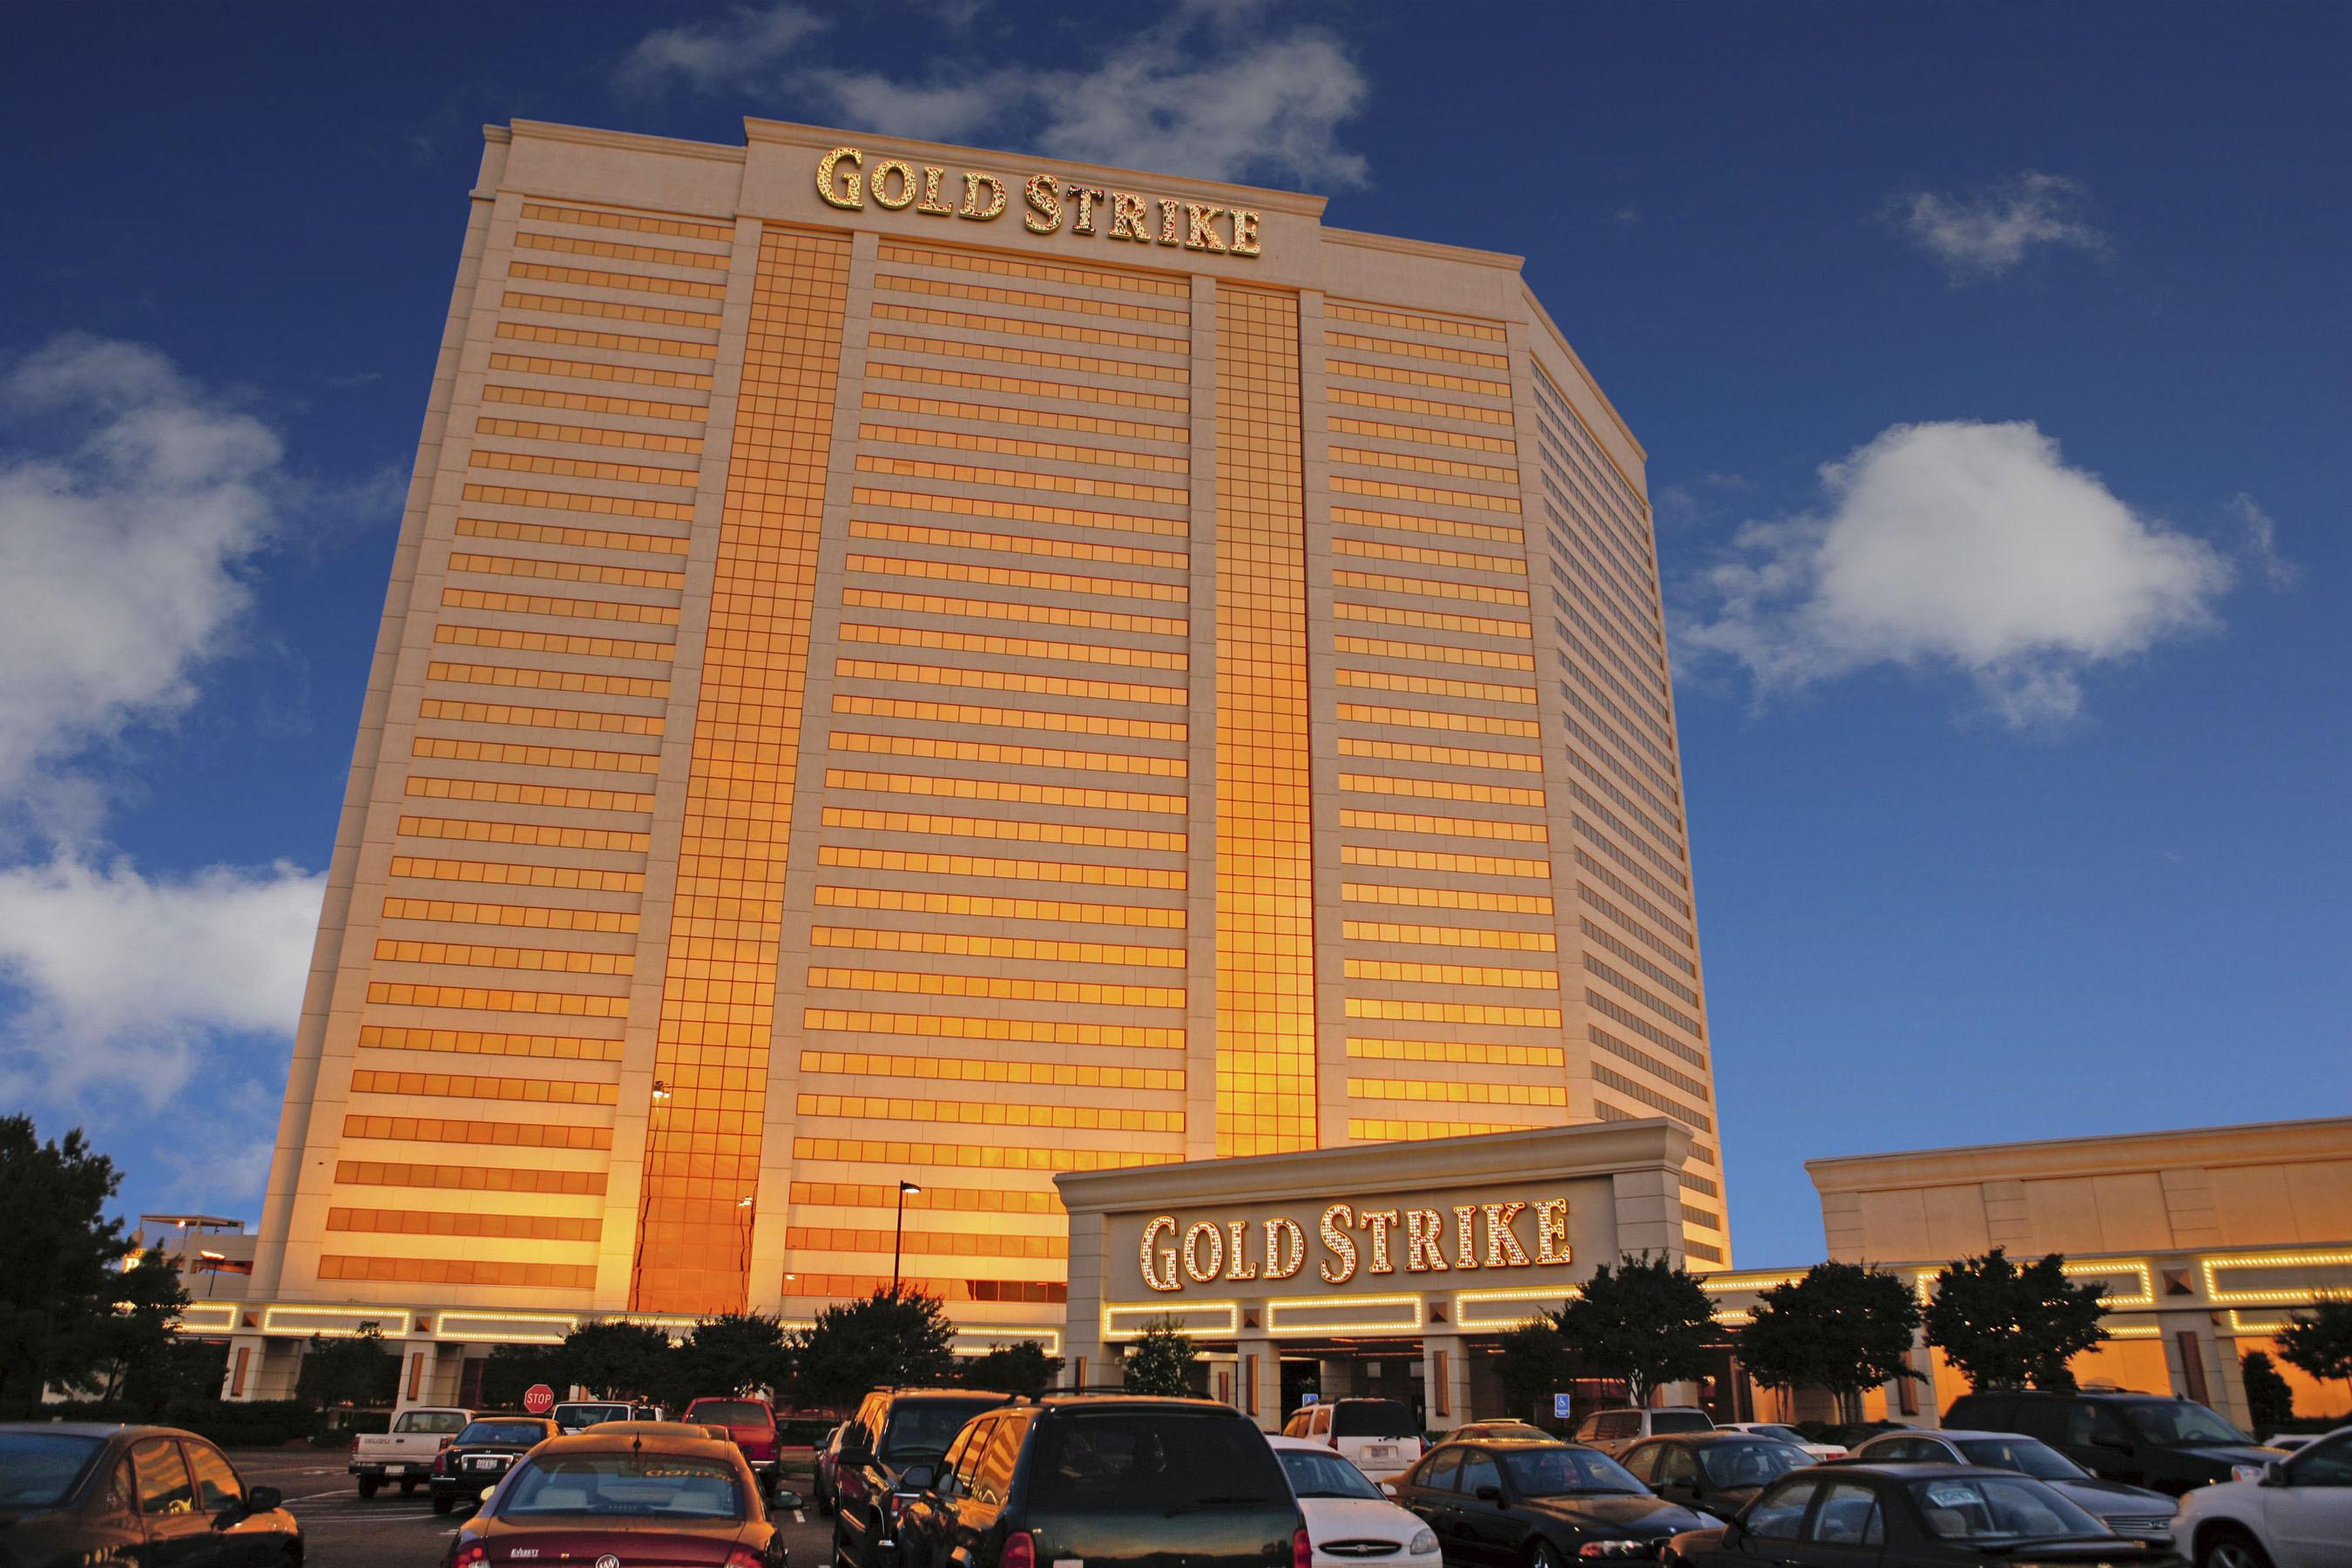 Discount code for golden moon casino lodging valentino casino